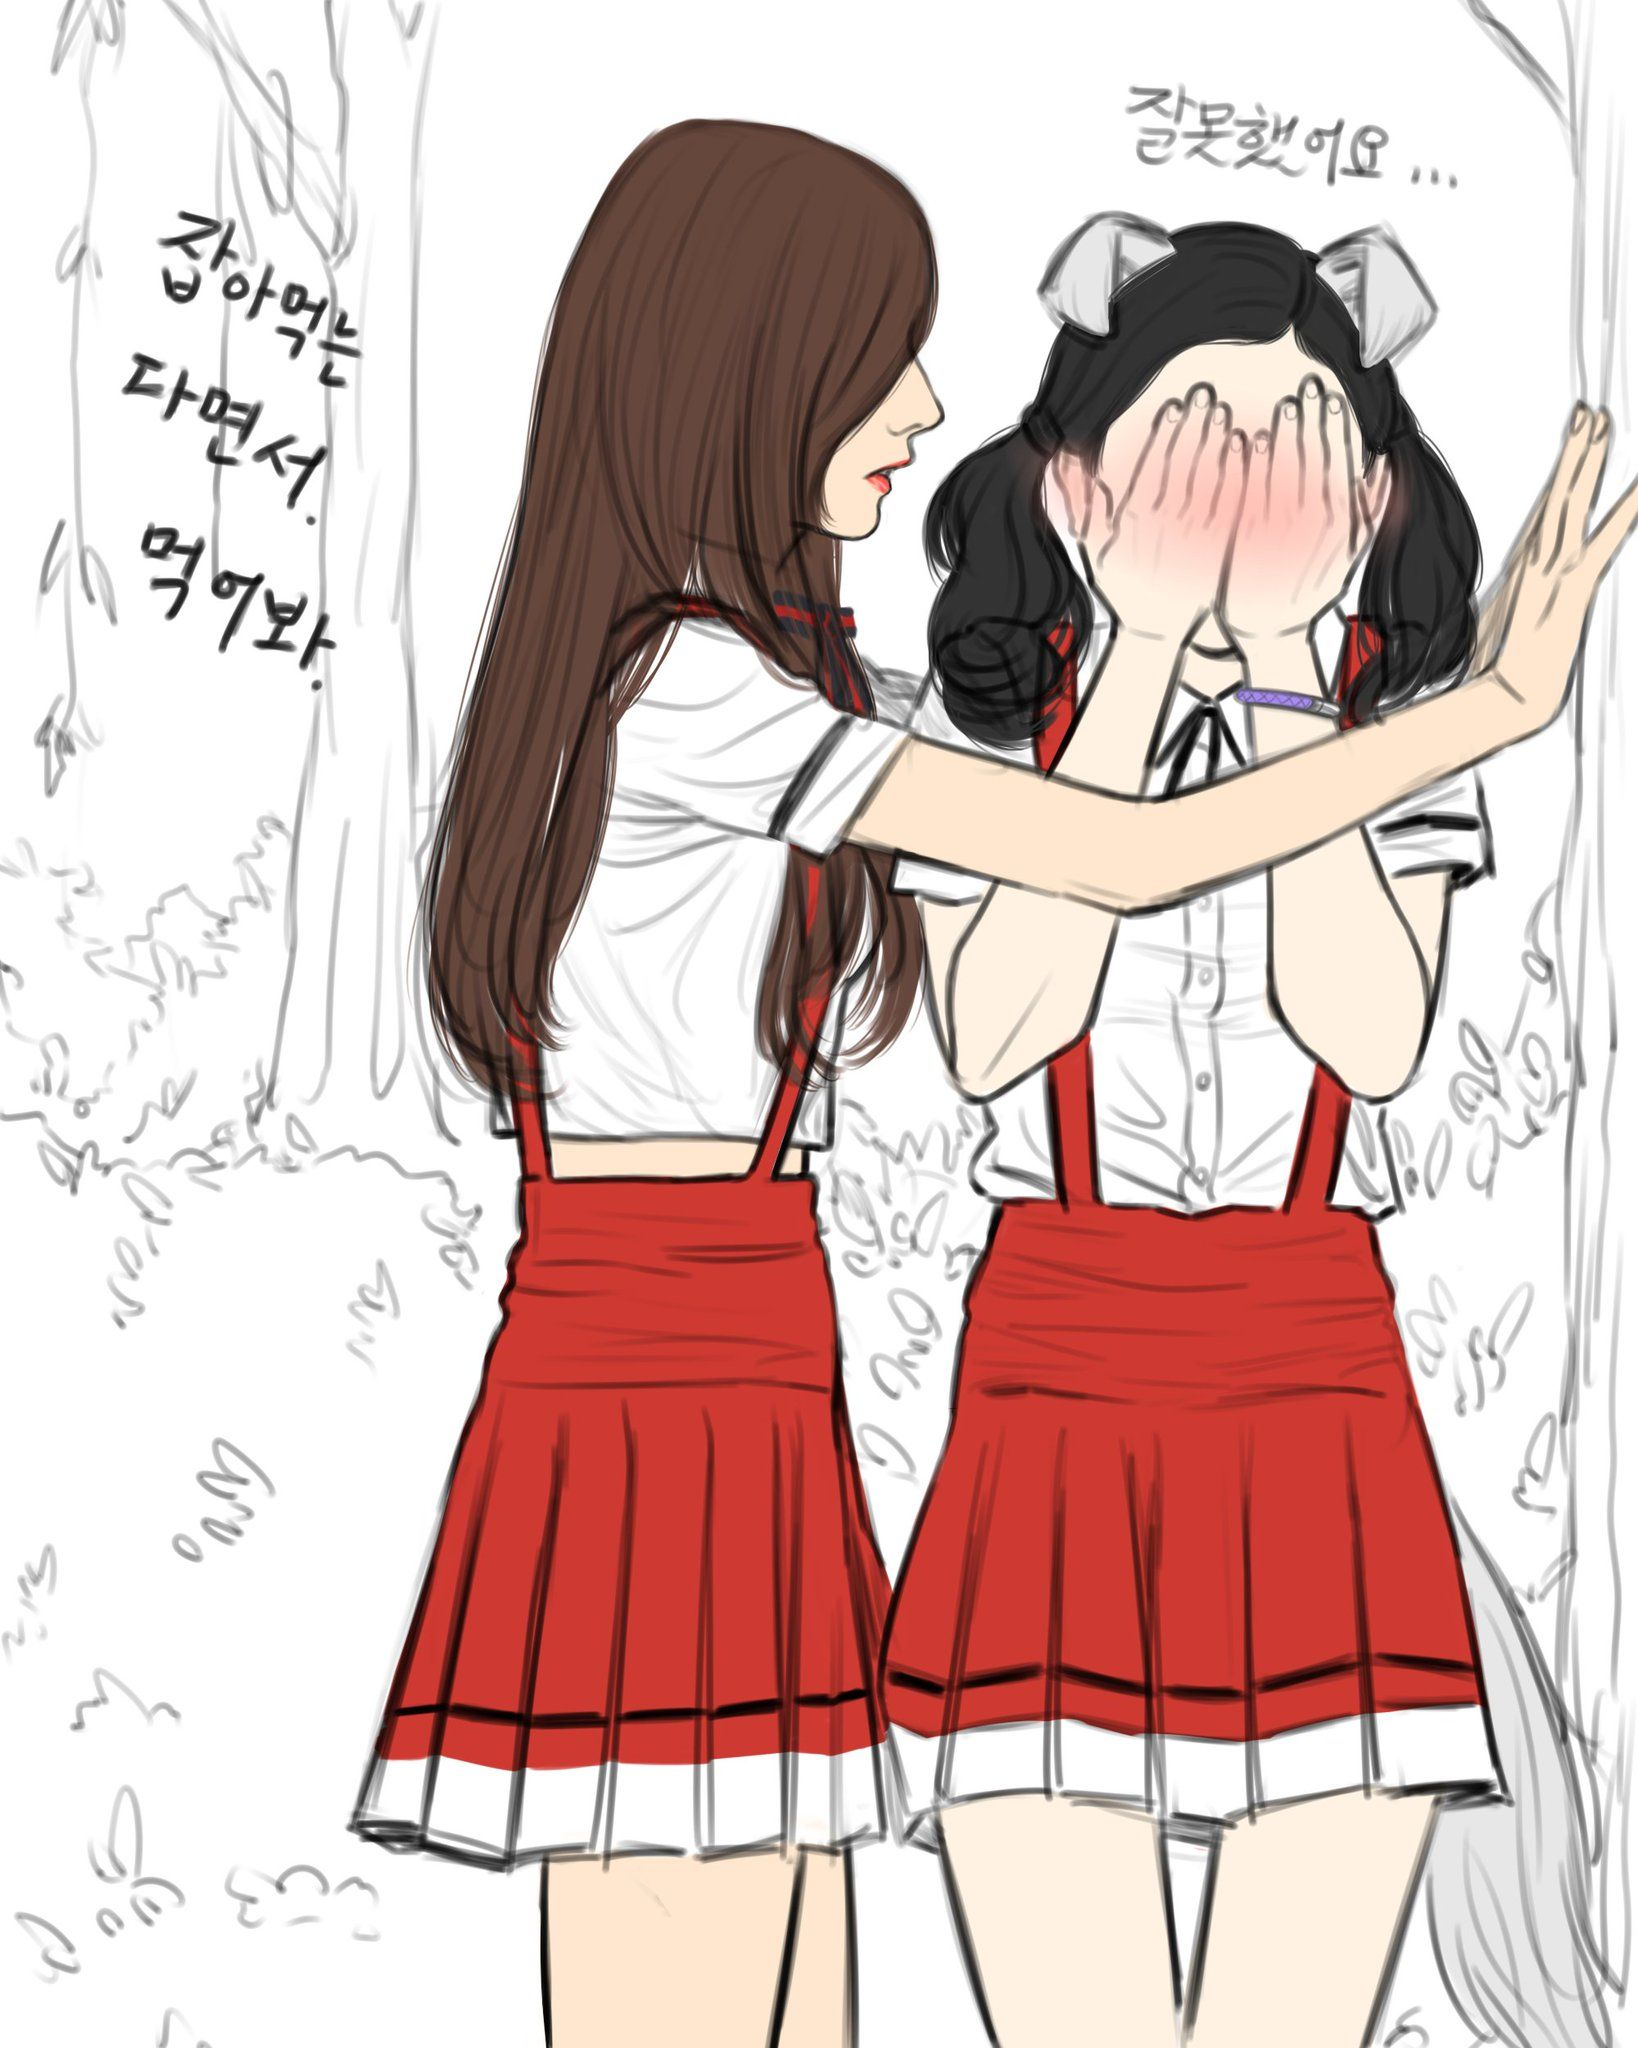 Pin By Michaengmelifeu On Sanake And Eagle Twice Fanart Cute Lesbian Couples Anime Art Girl